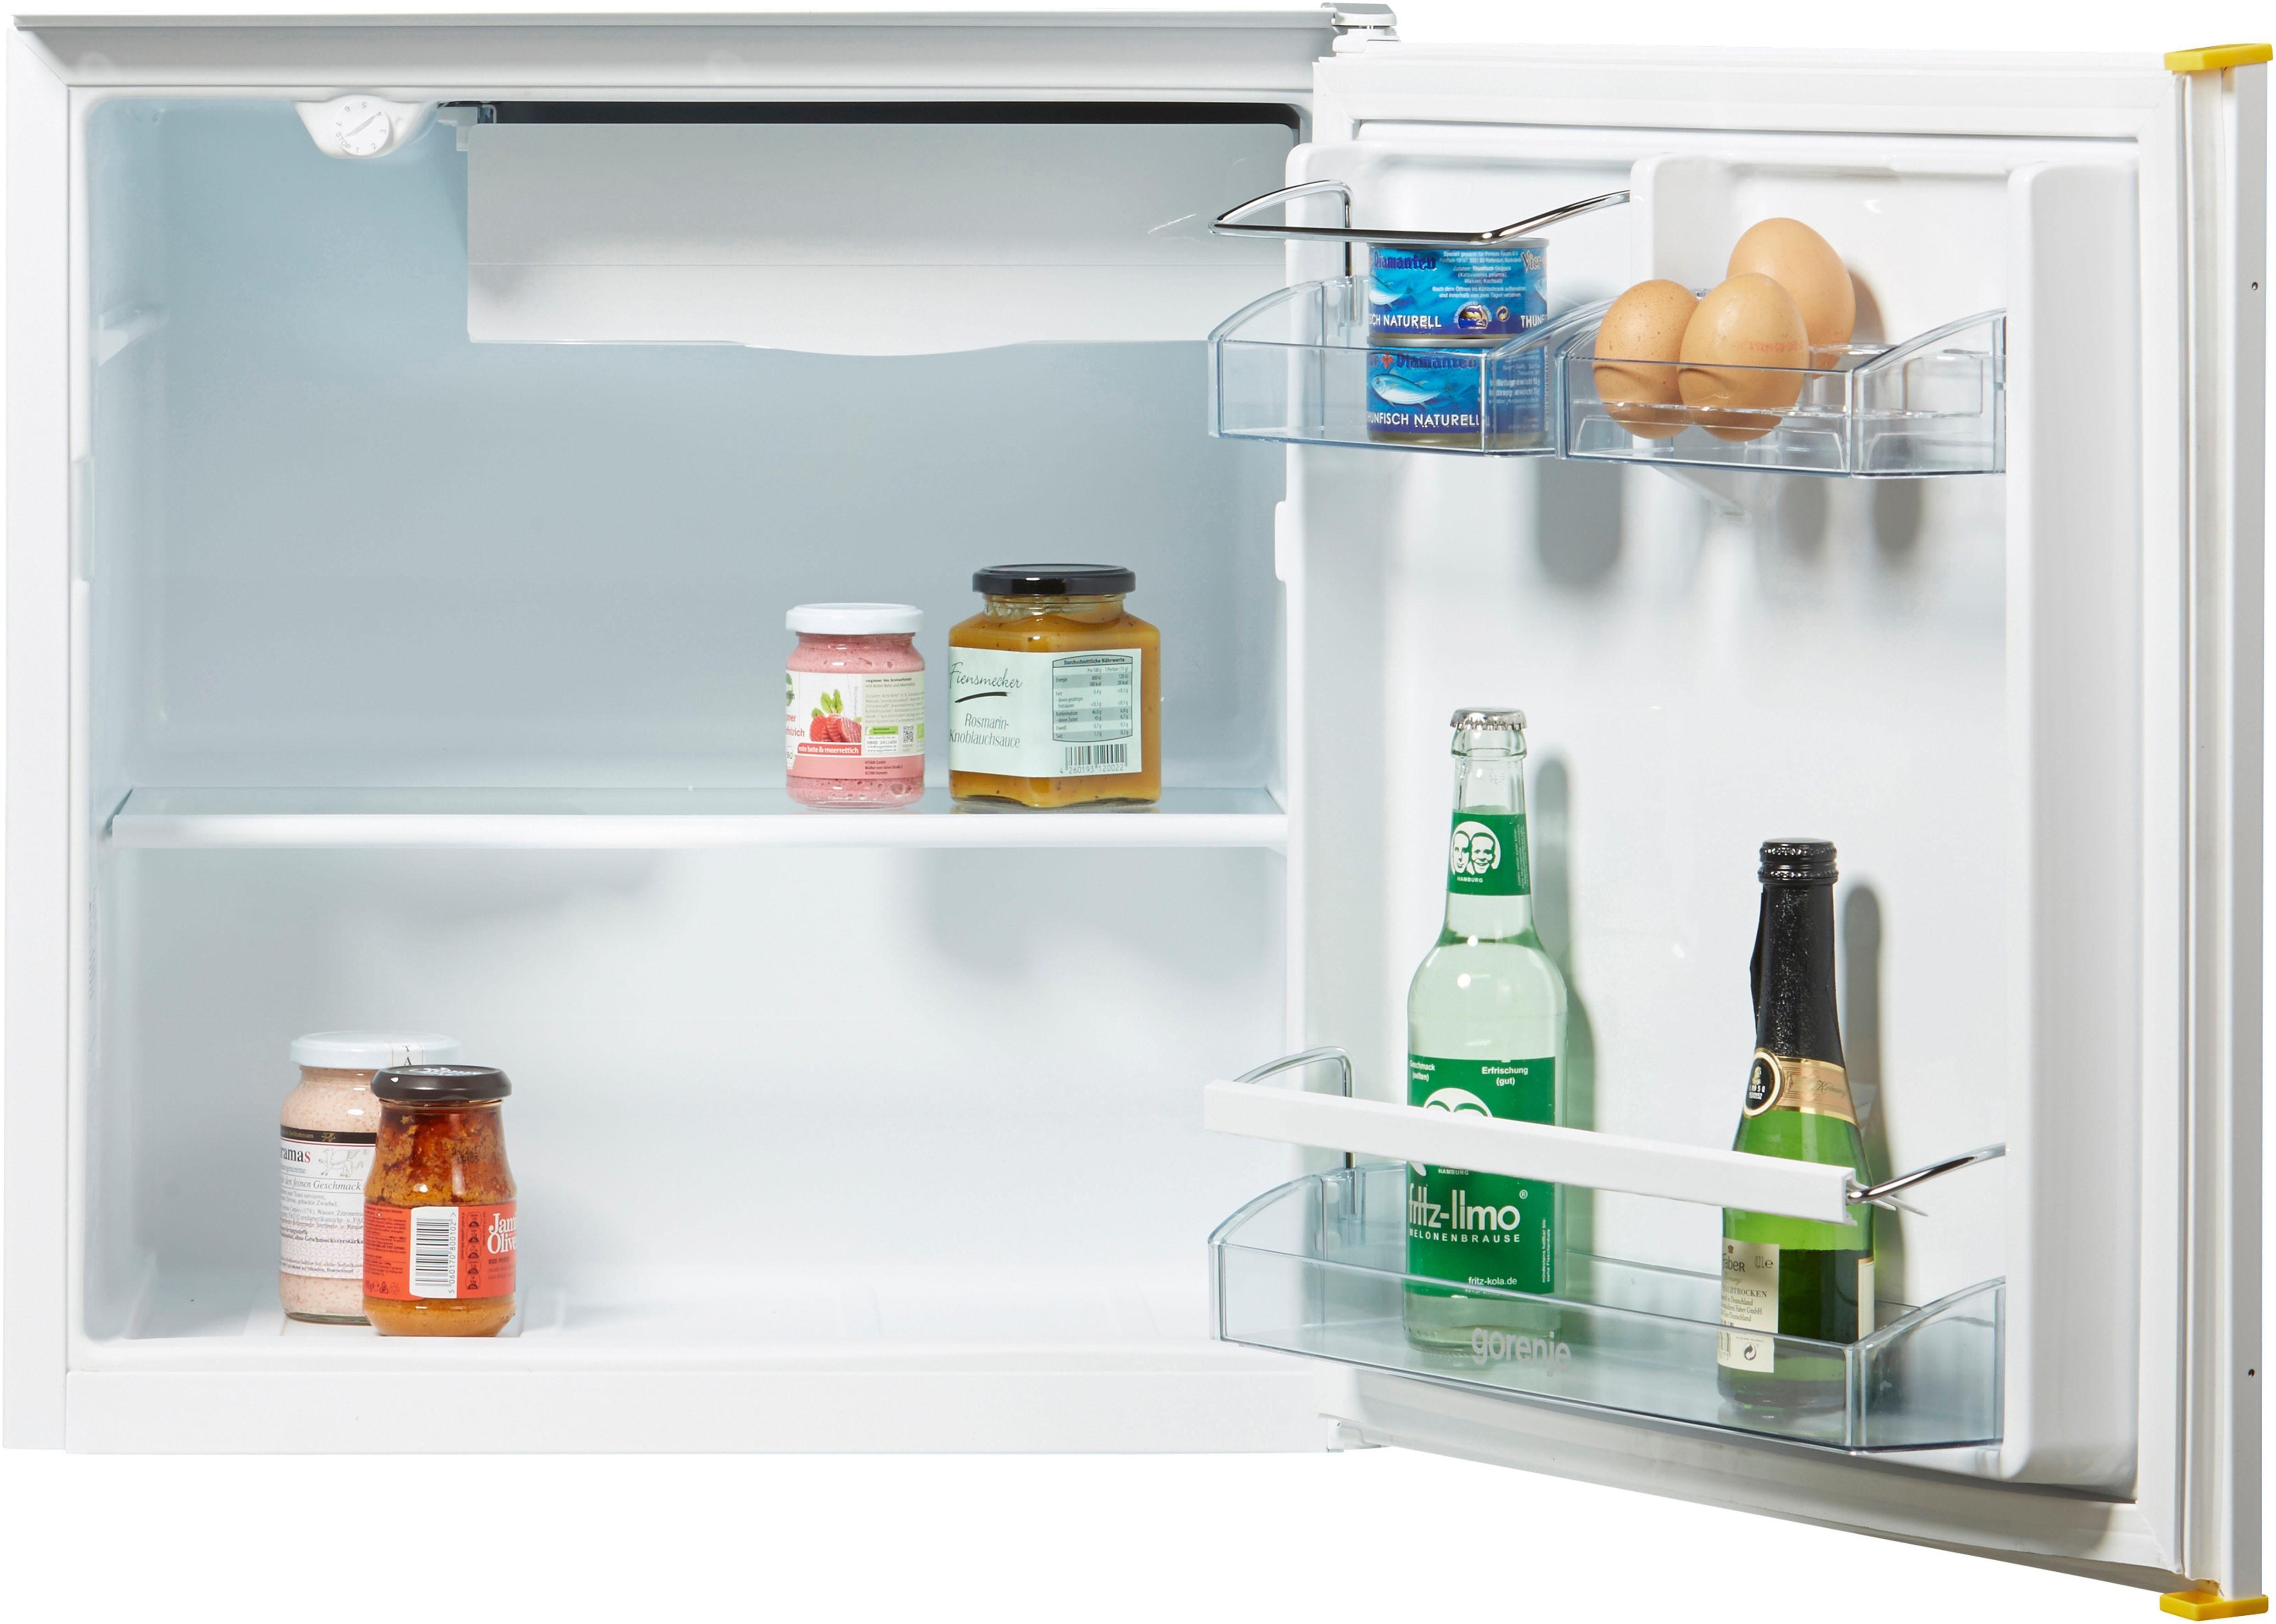 Amica Kühlschrank 55 Cm : Gorenje einbaukühlschrank rbi aw cm hoch cm breit